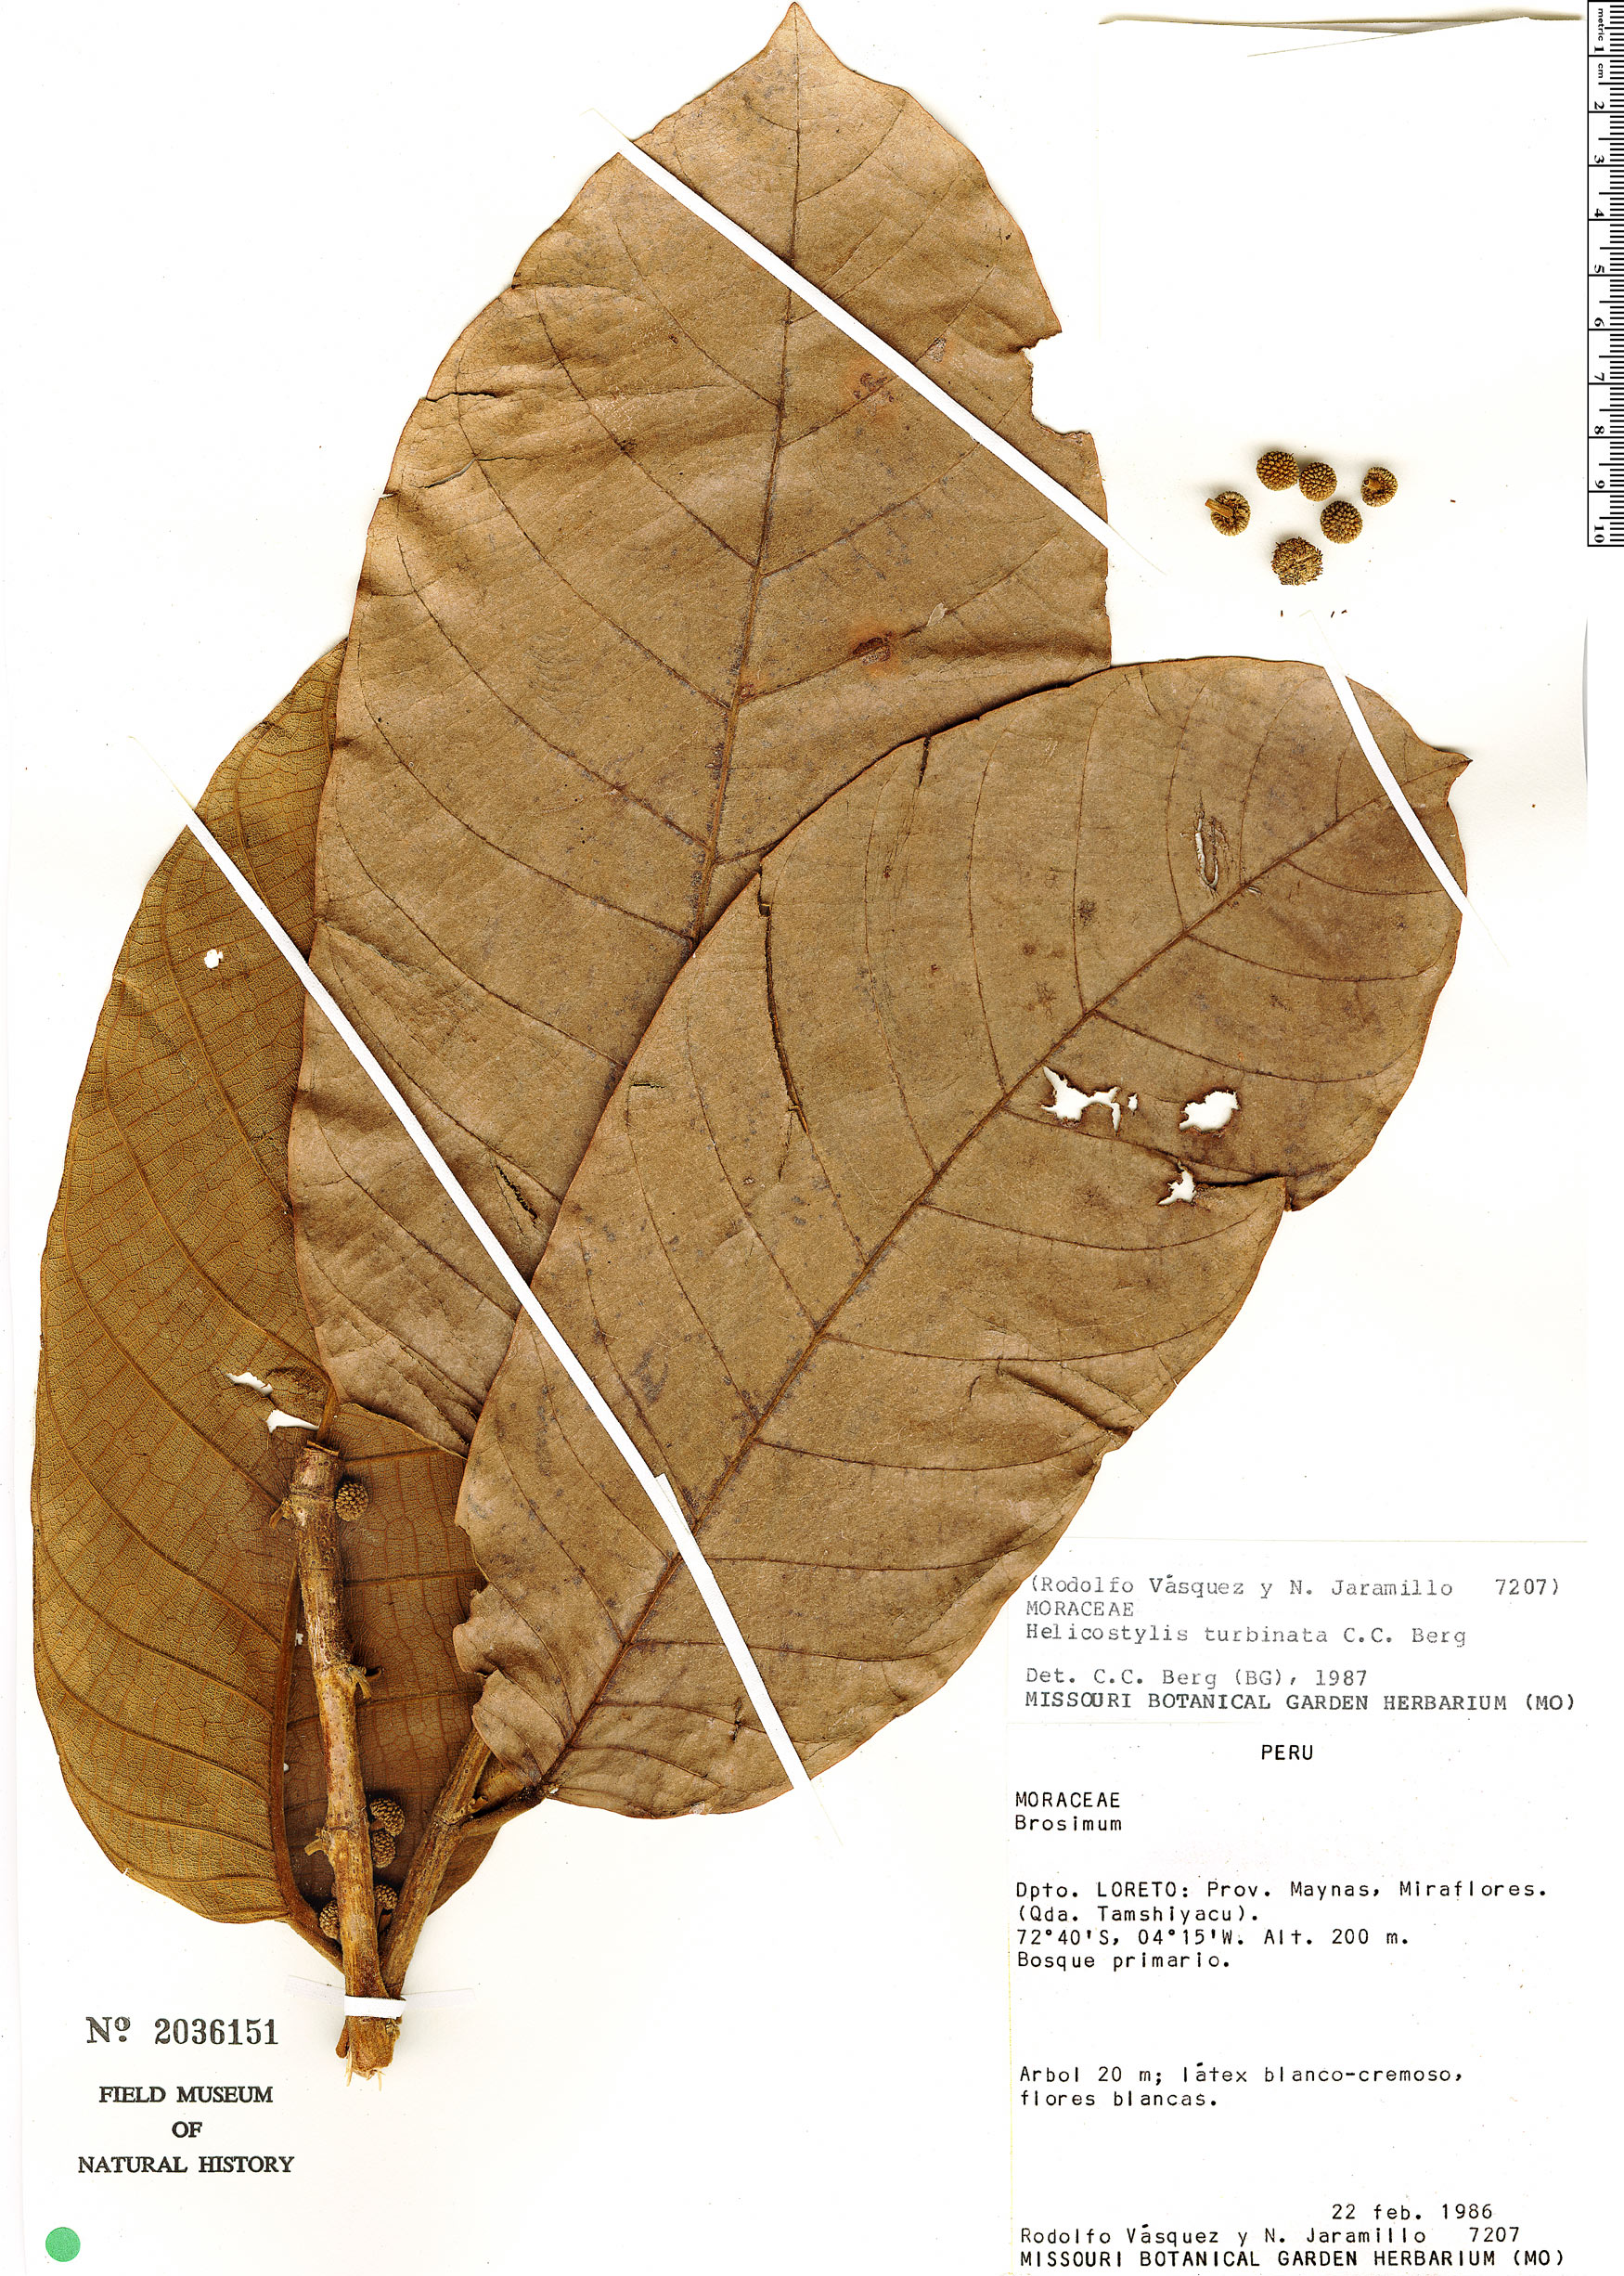 Specimen: Helicostylis turbinata